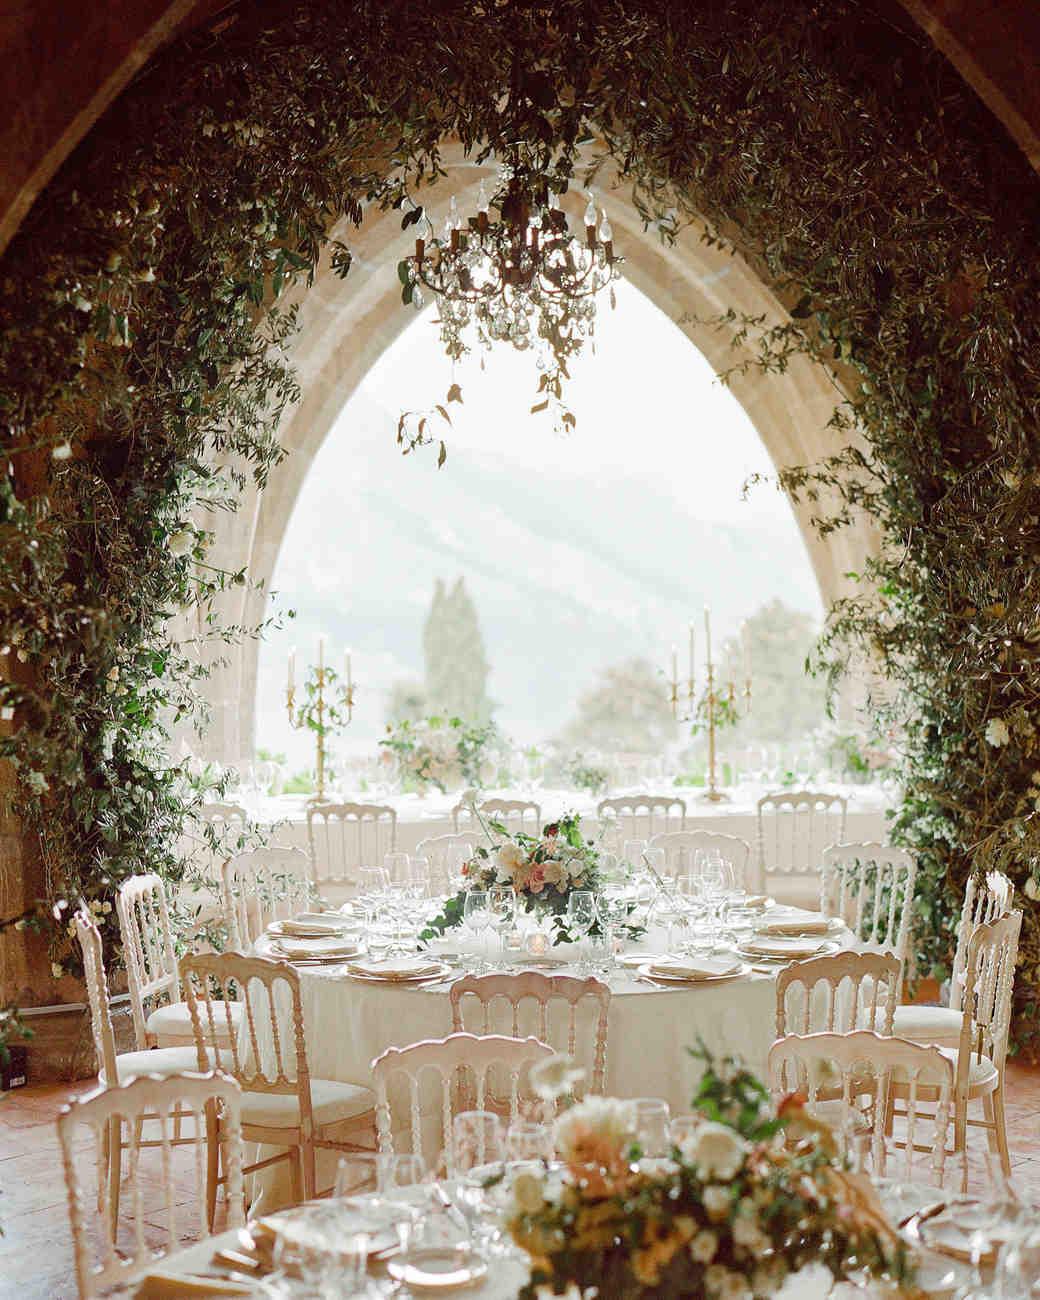 lisa-greg-italy-wedding-reception-table-103312986_vert.jpg